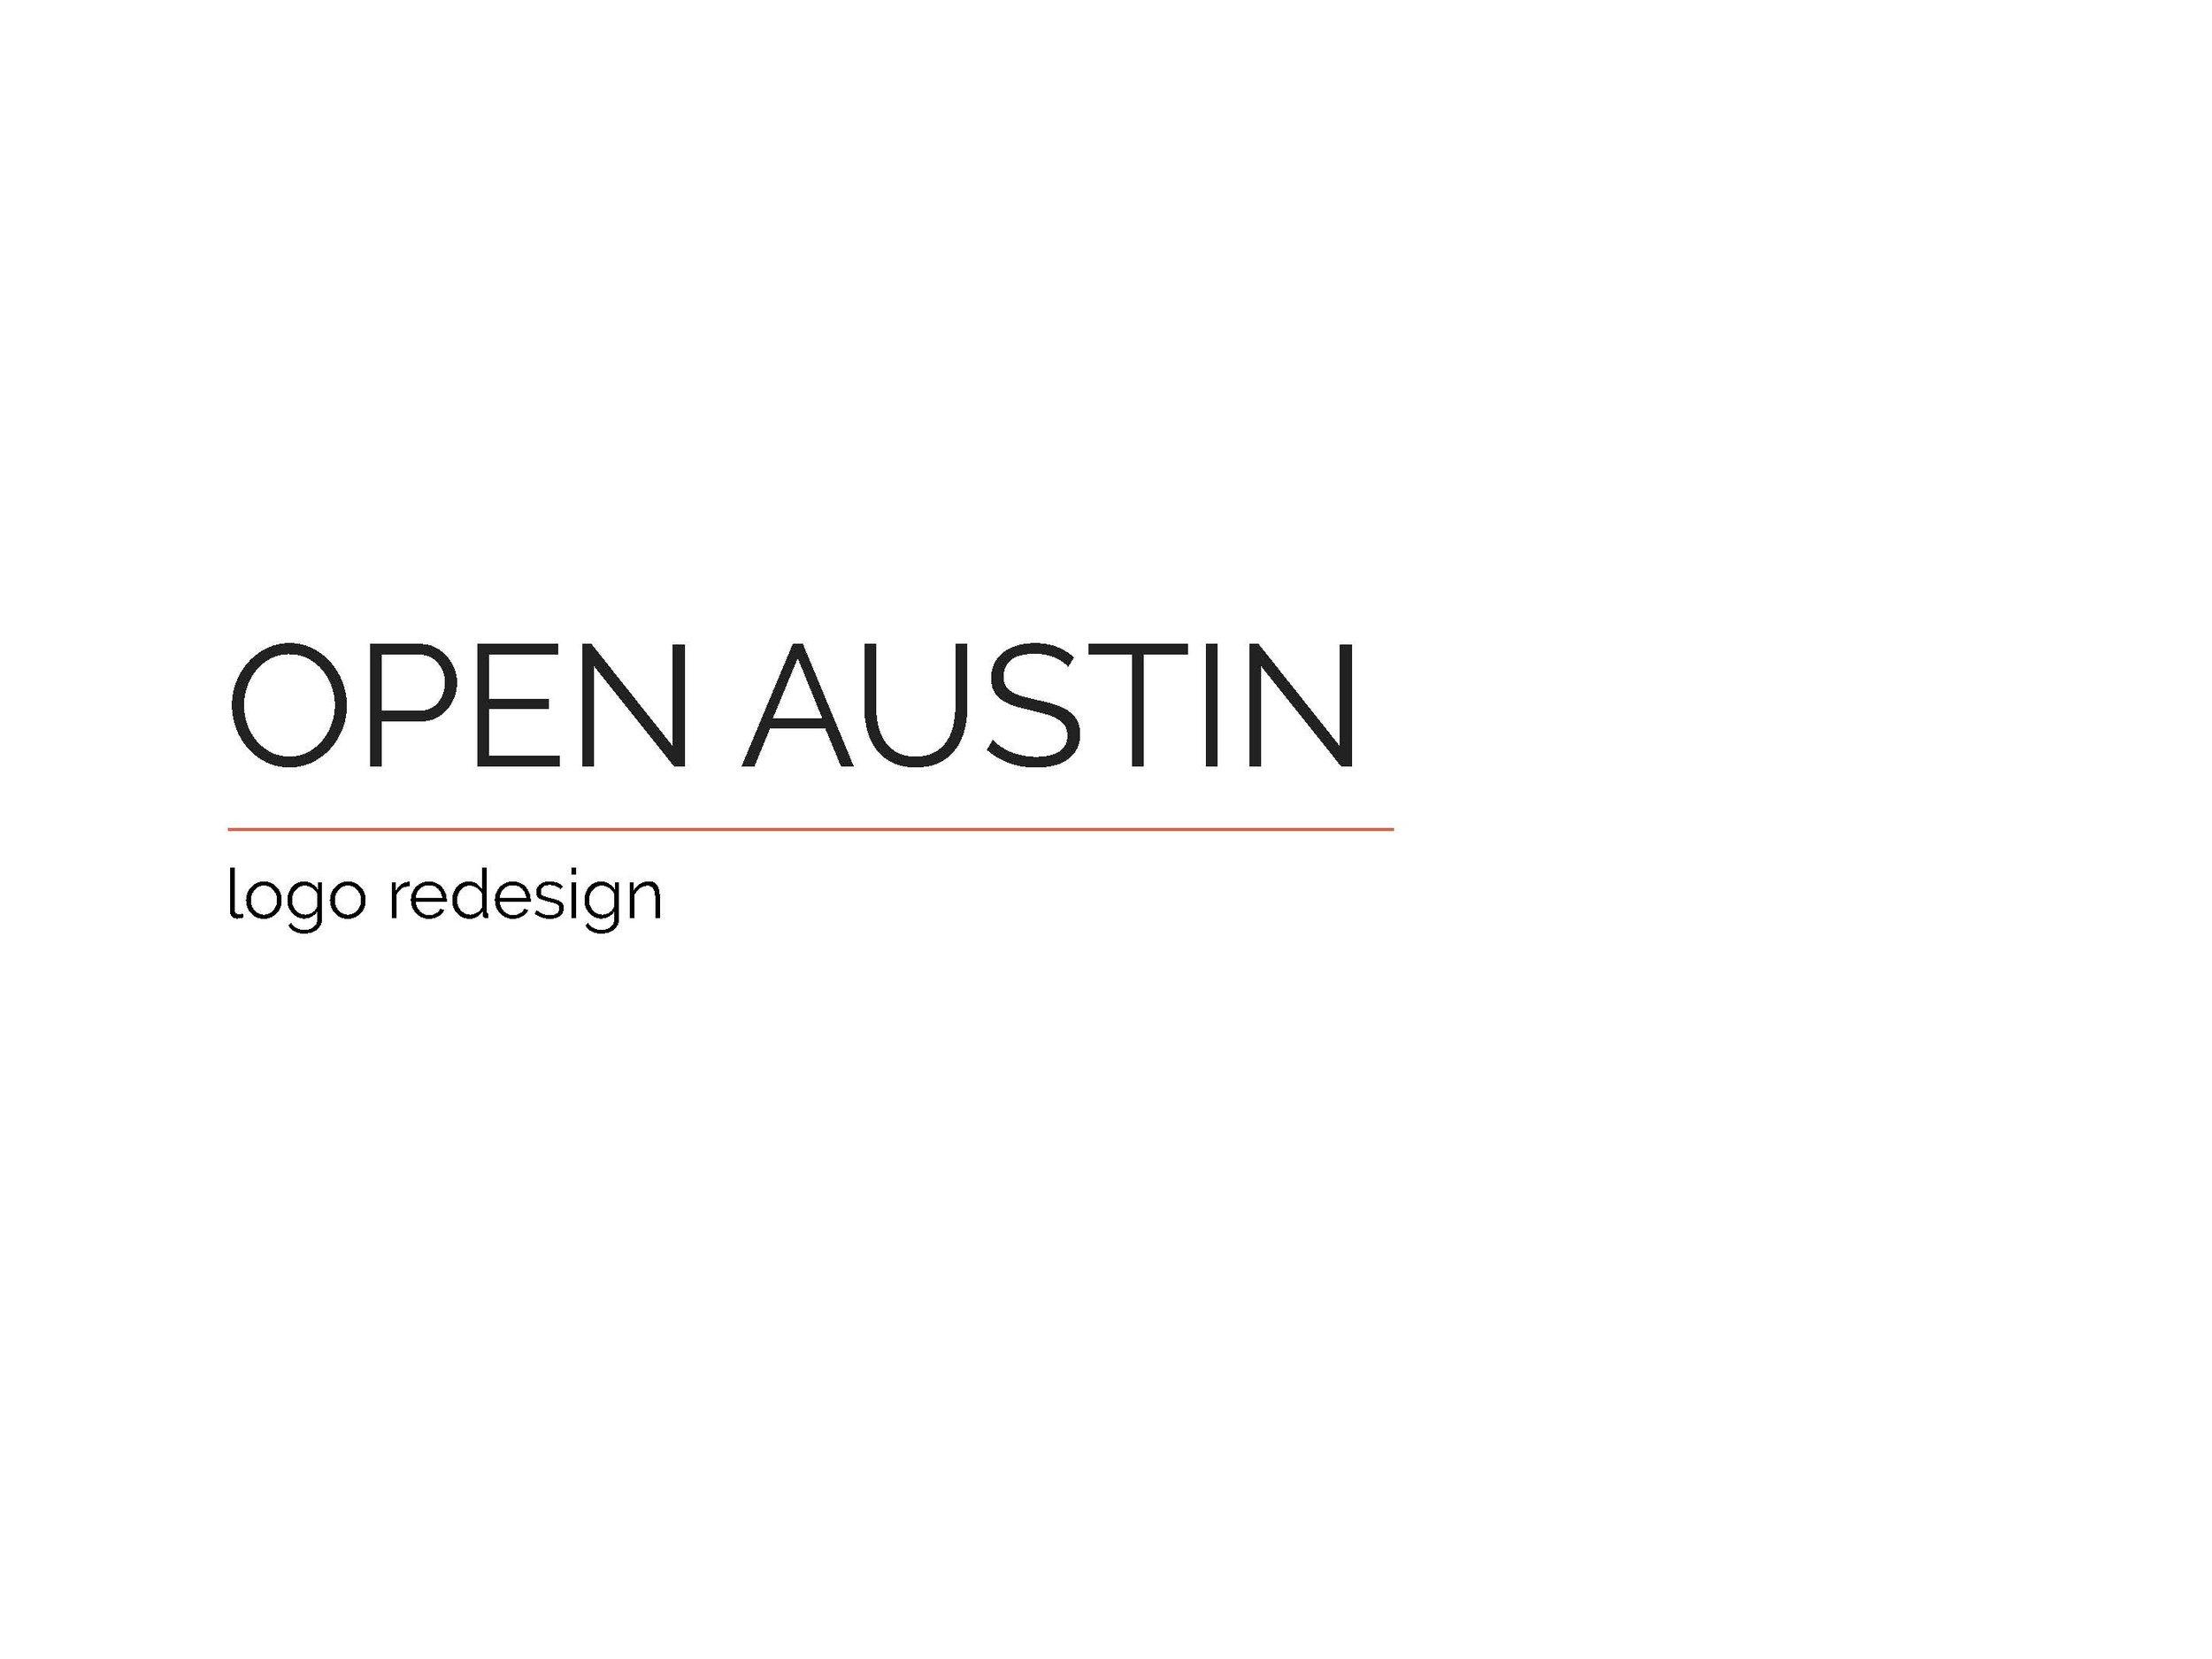 openaustinlogopresentation-160116162033_Page_01.jpg